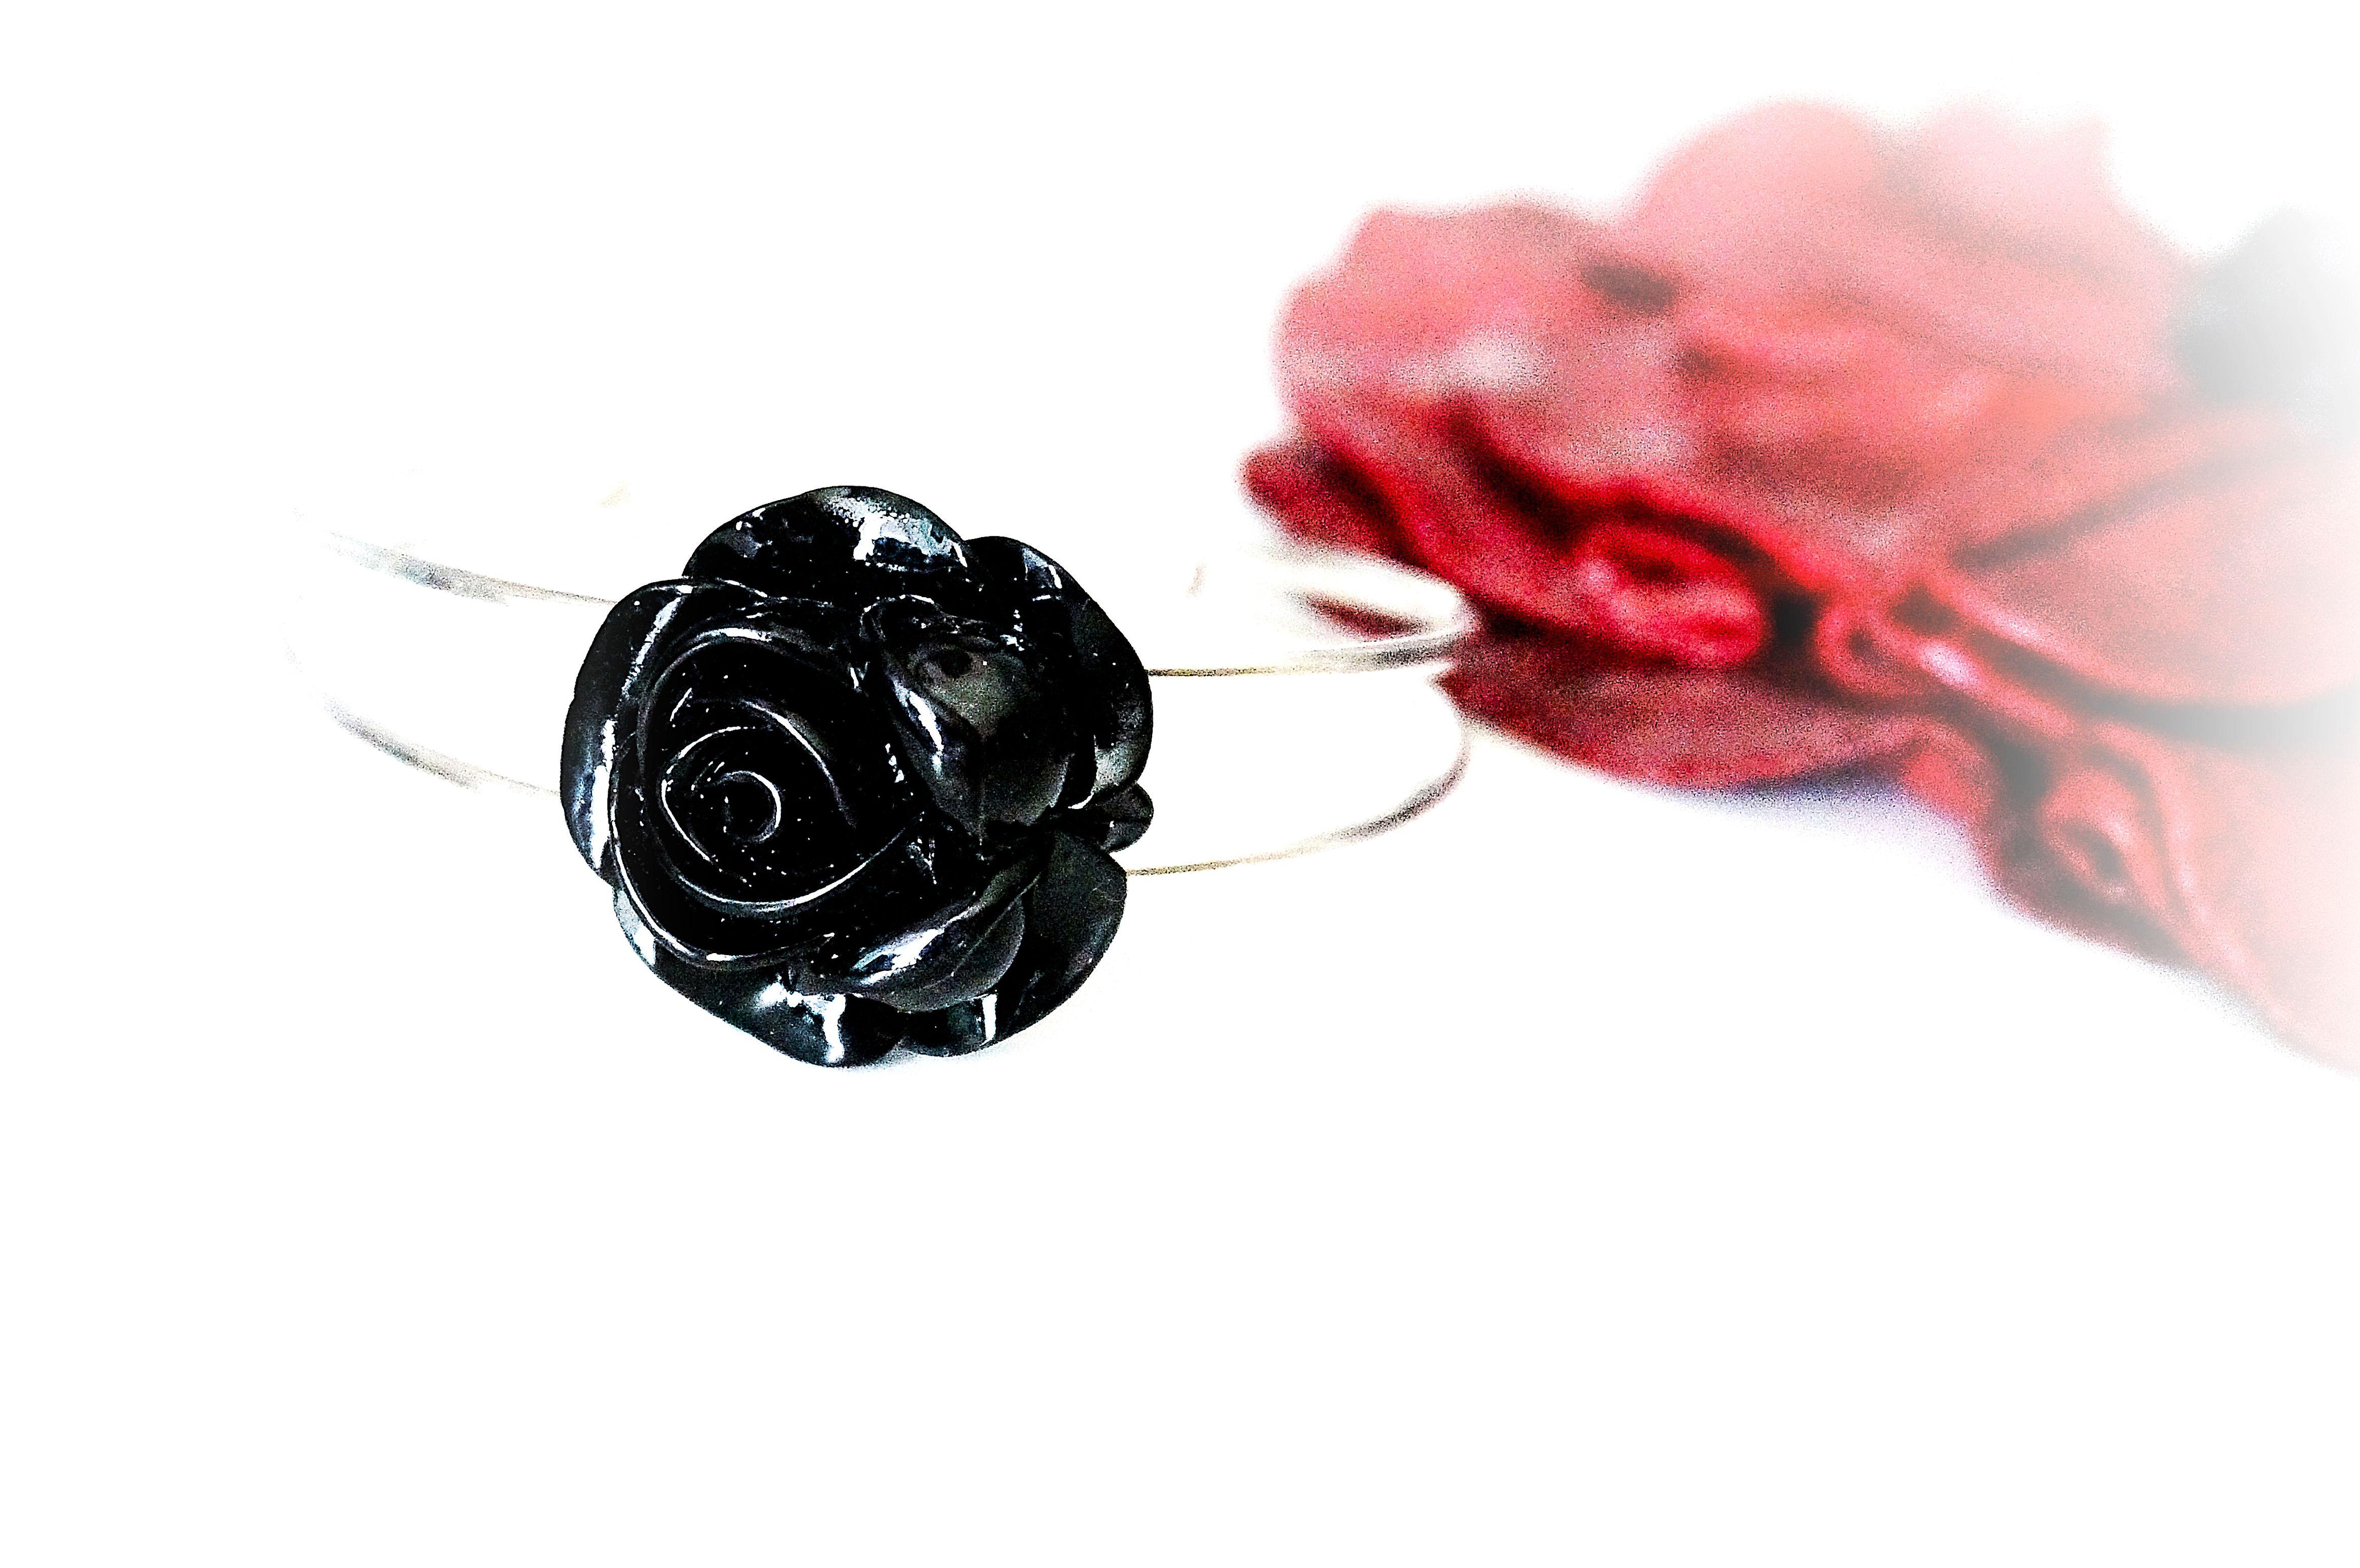 gothic_jewelry_cuff_metal_rubies_bracelet_birthday_anniversary_gift_bracelets_5.JPG